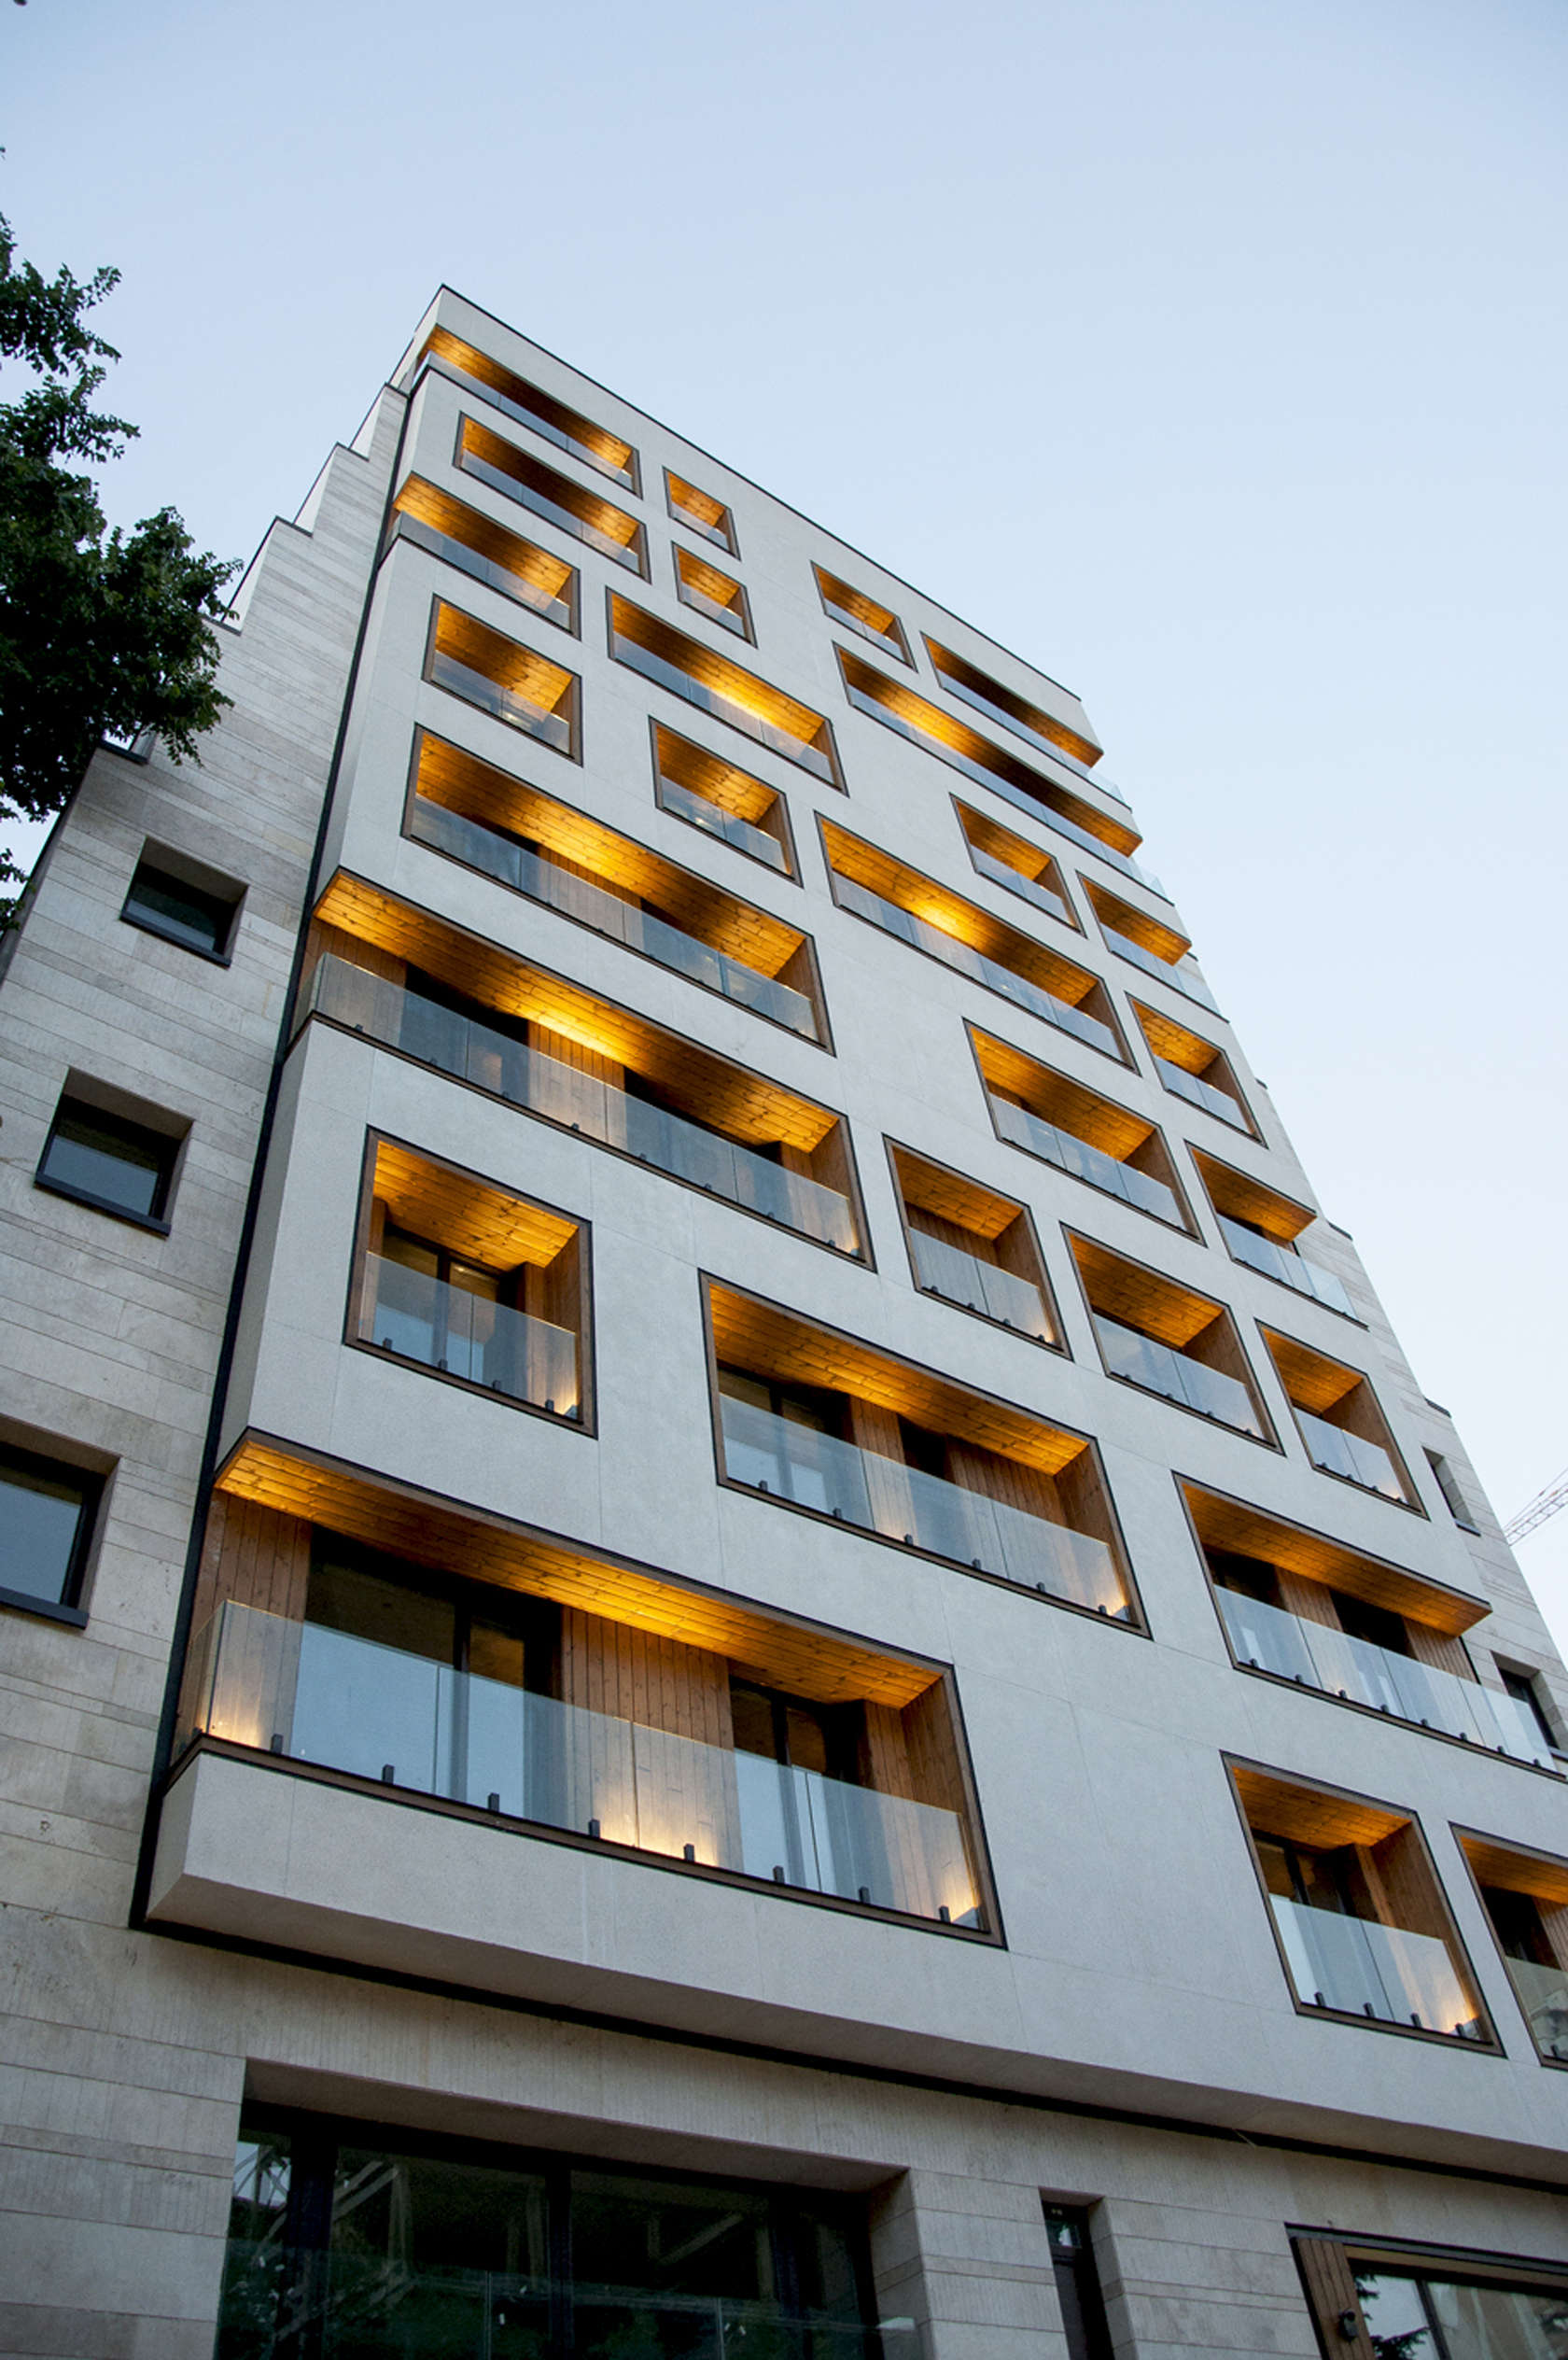 Haiat e elahie residential building d coration de la - Appartement atypique studio persian primavera ...